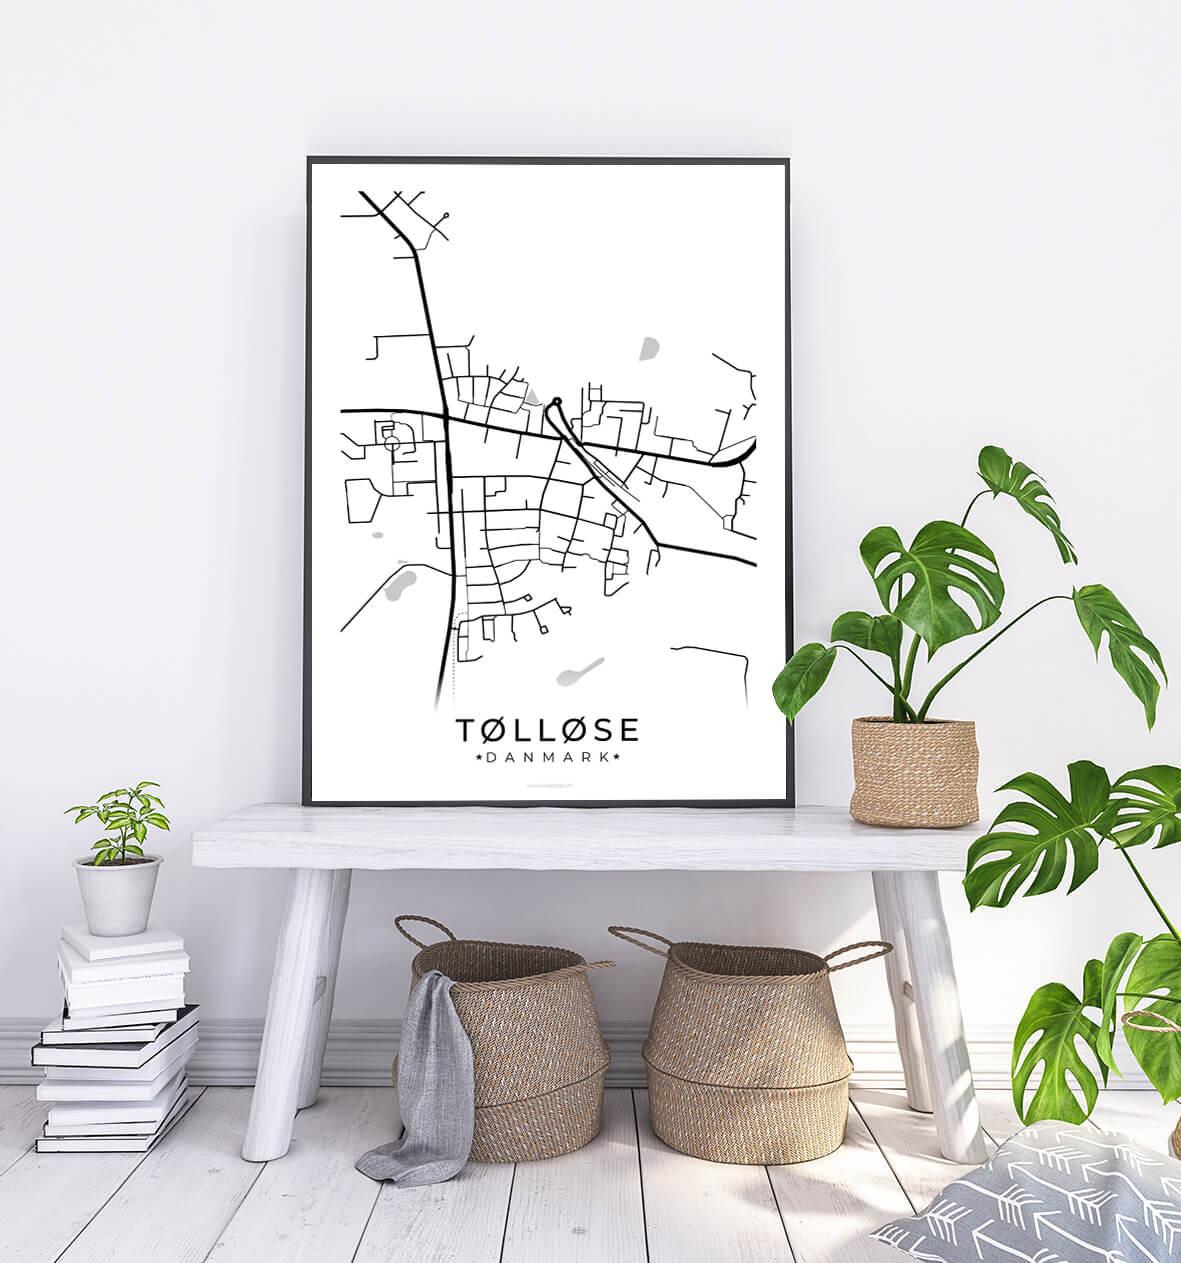 Toelloese-plakat-hvid-3